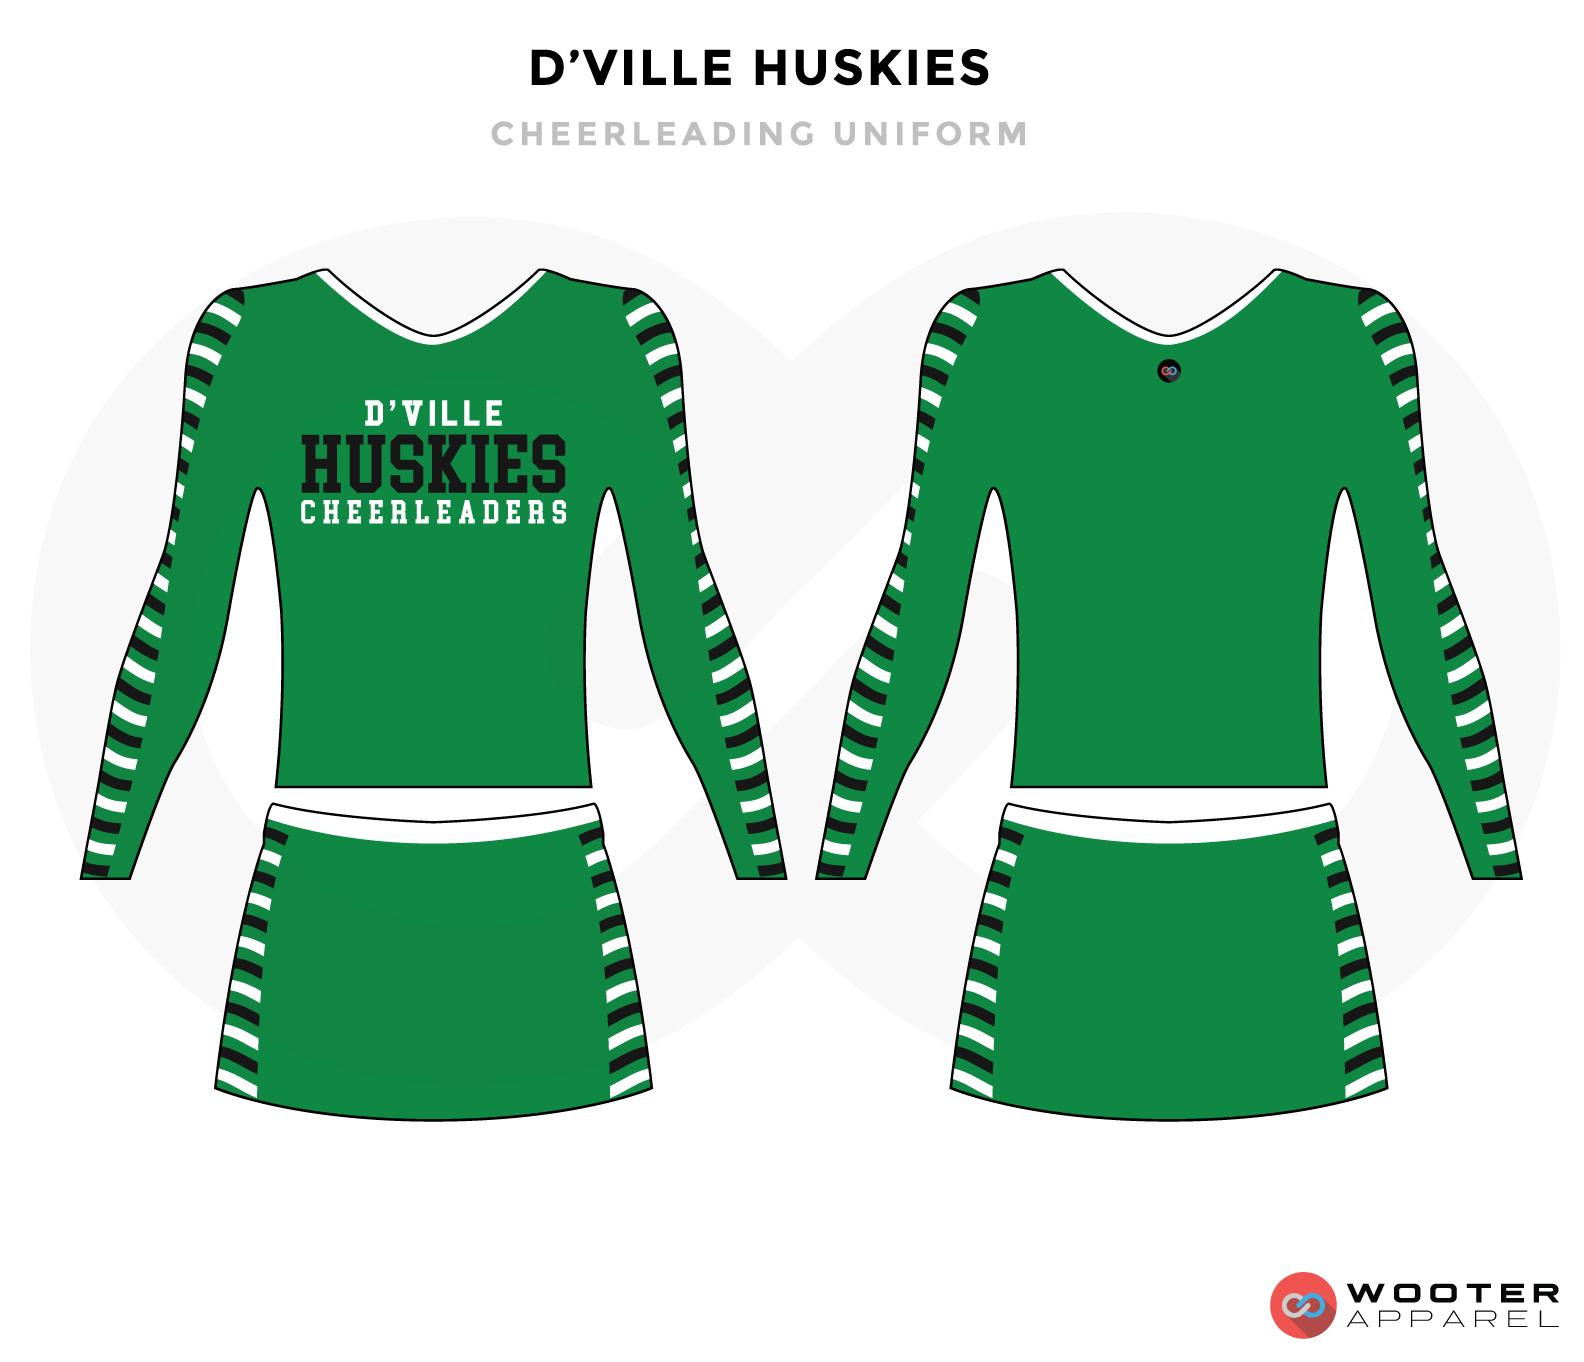 D'VILLE HUSKIES green black white cheerleading uniforms, top, and skirt